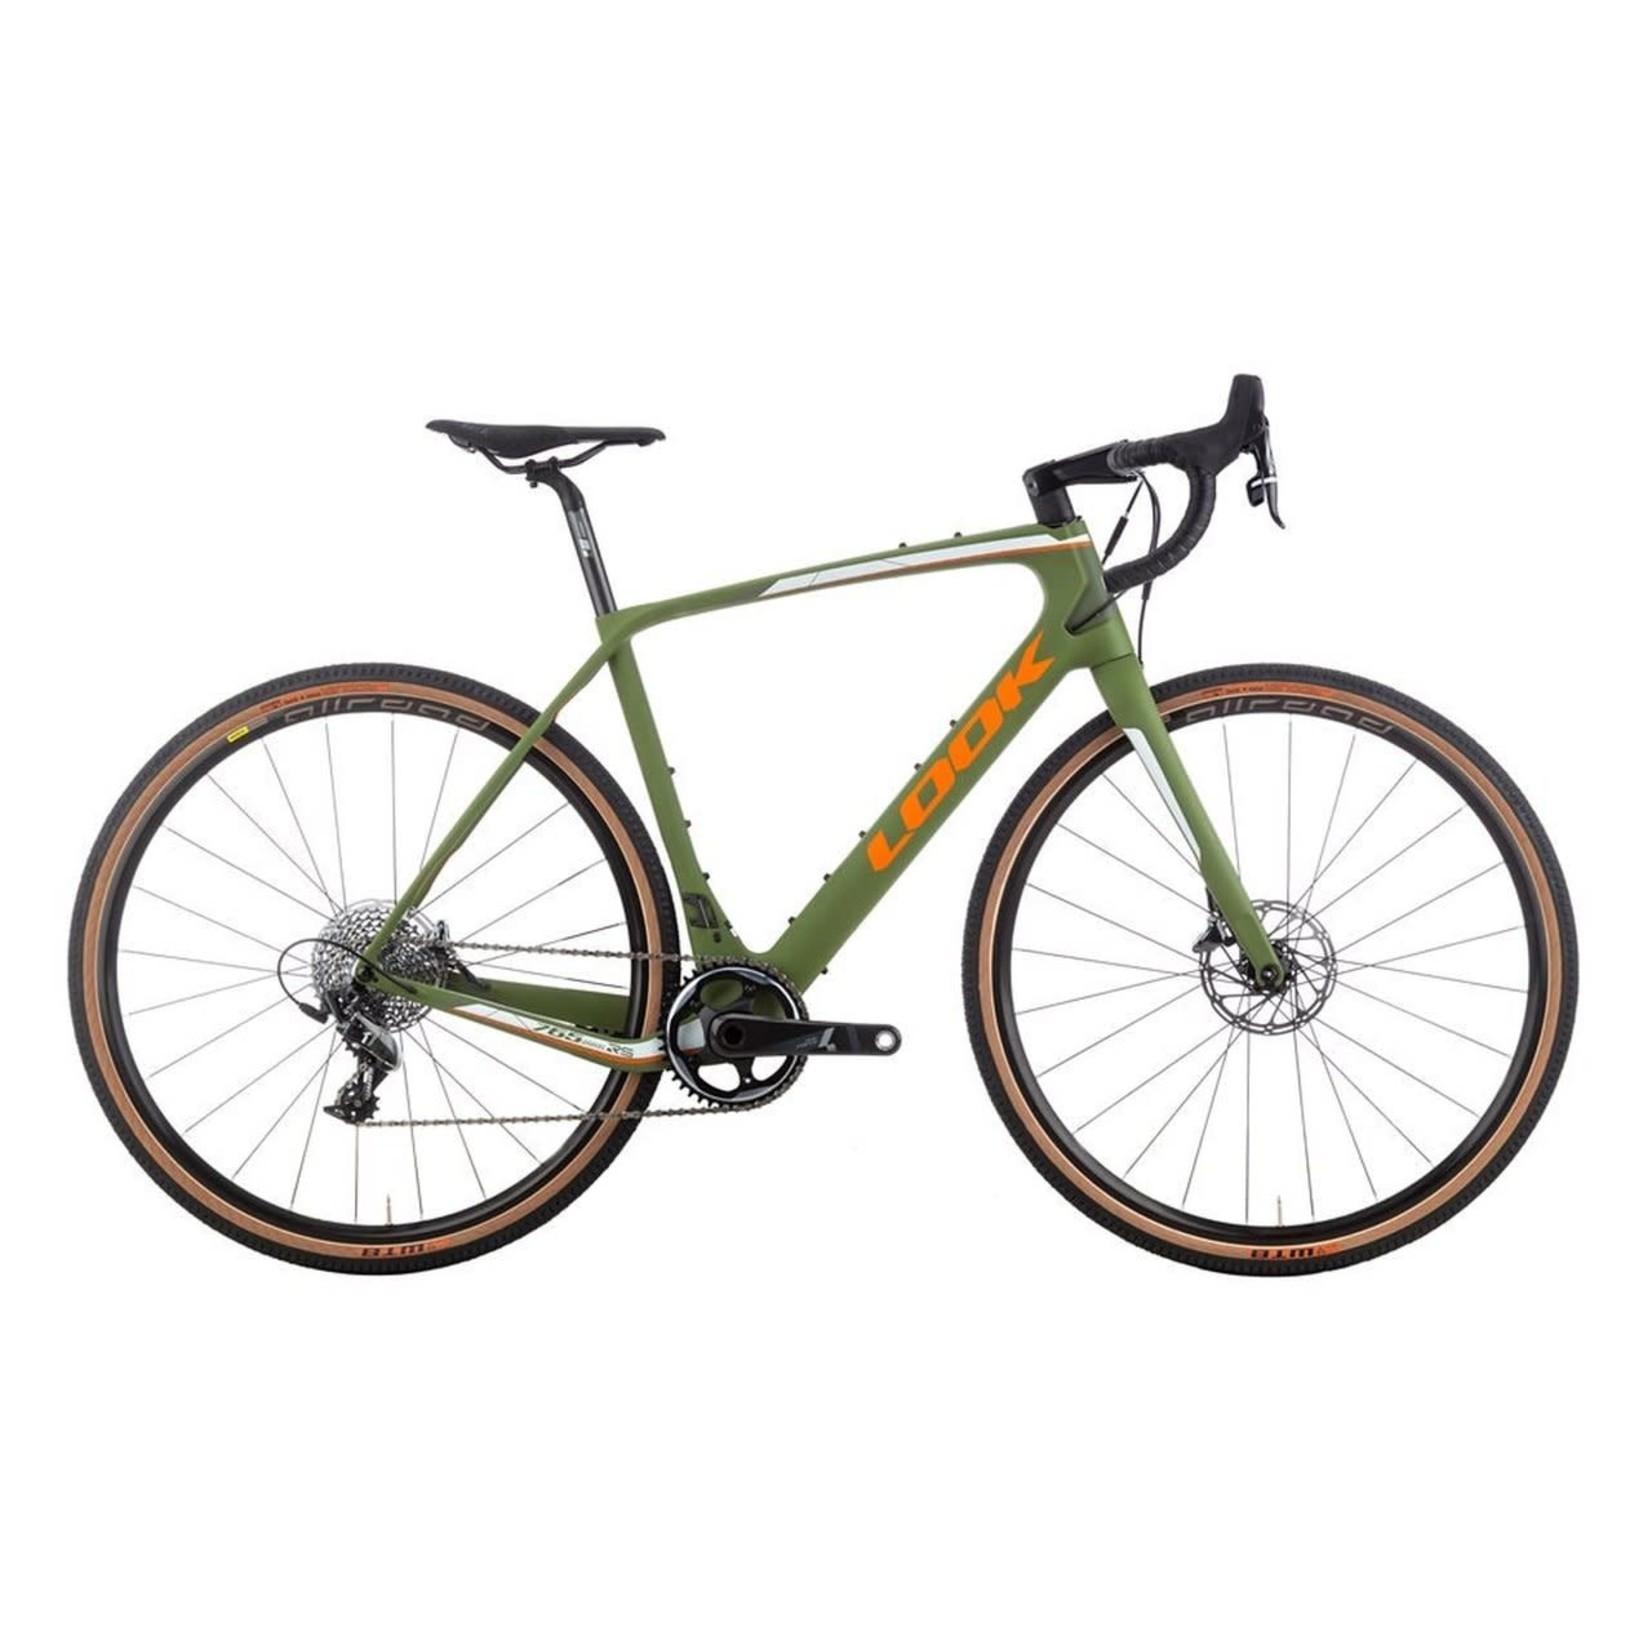 Look LOOK 765 Gravel RS -LG- Green